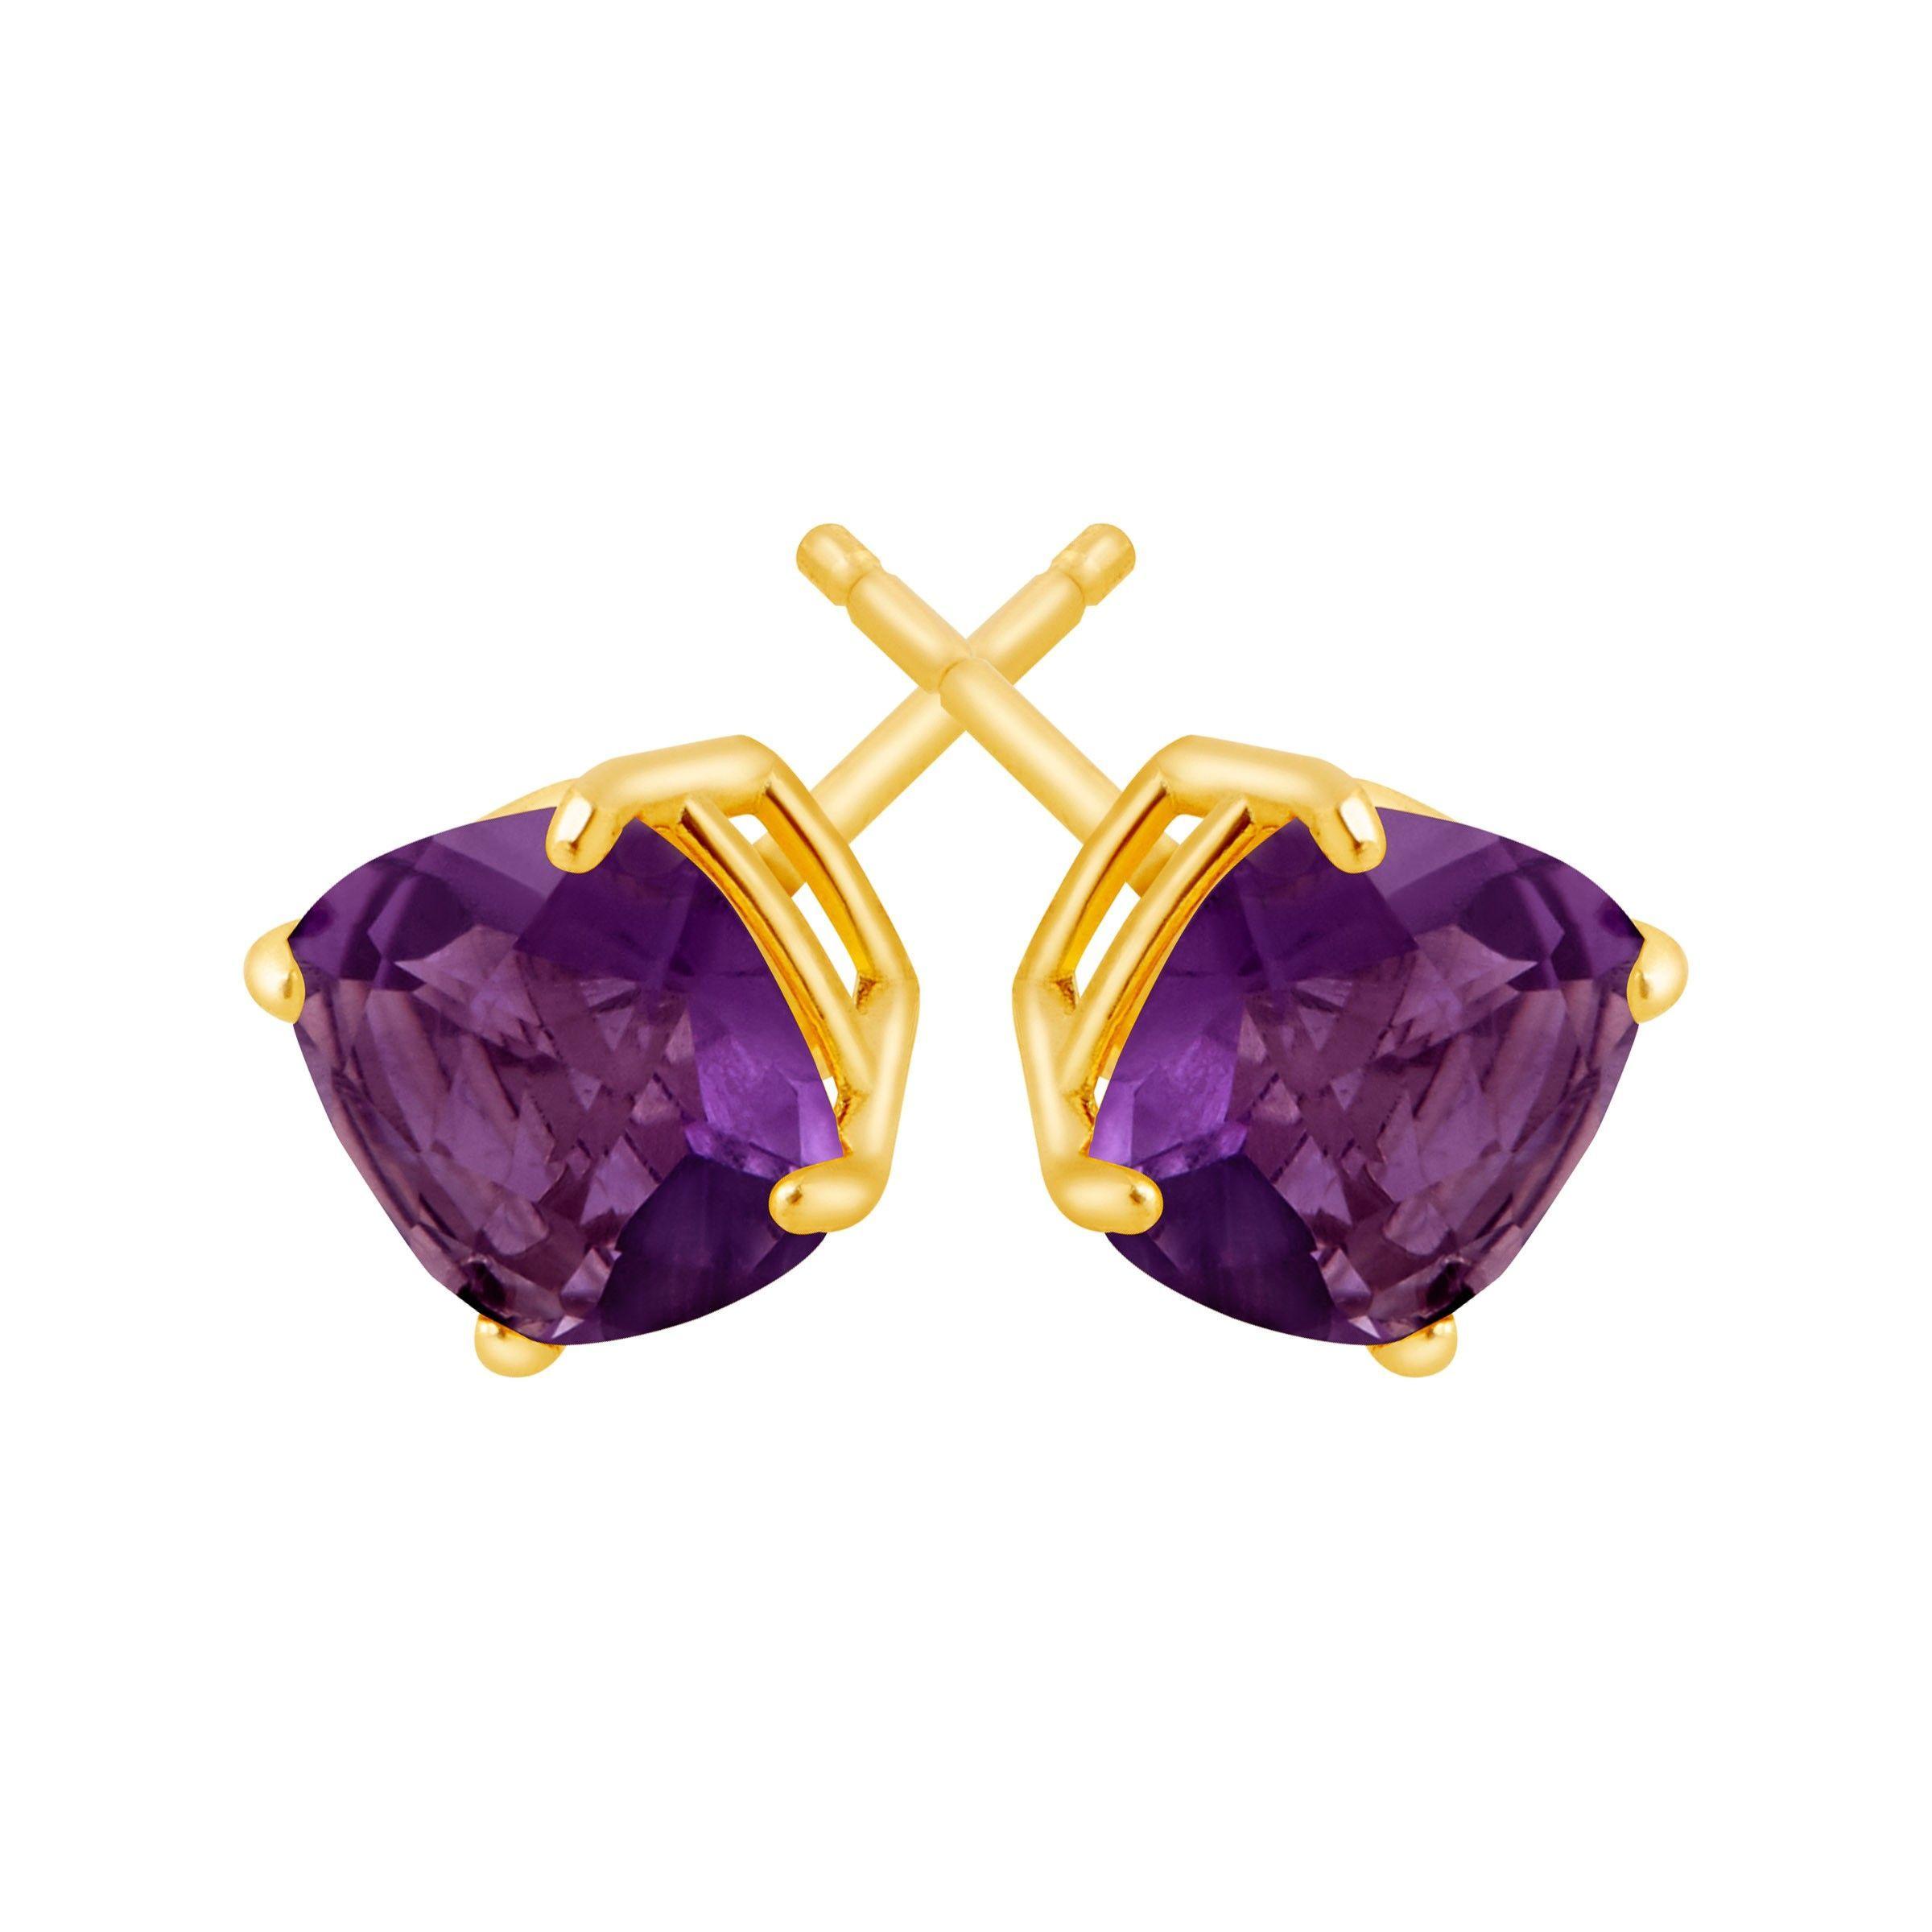 Cushion-Cut-Color-Stone-Stud-Earrings-in-14K-Gold thumbnail 7